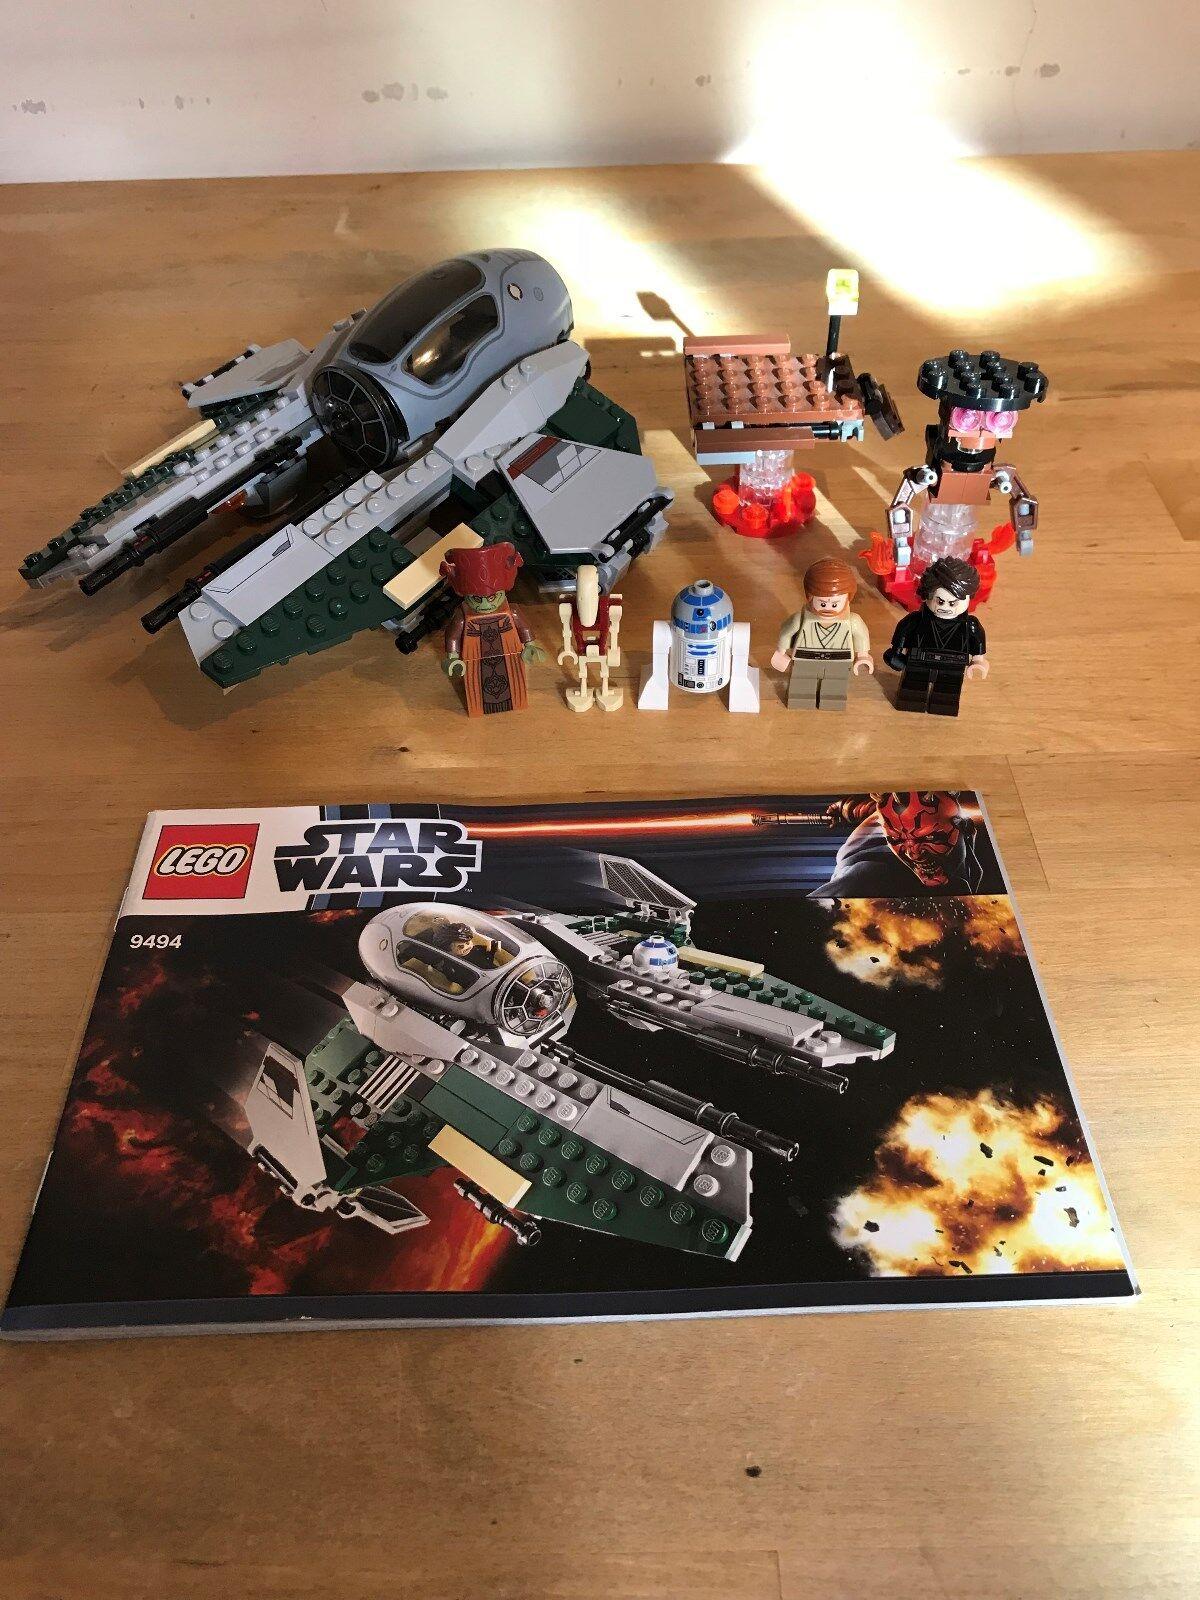 Lego Star Wars 9494 - Anakin's Jedi Interceptor (Boxed)